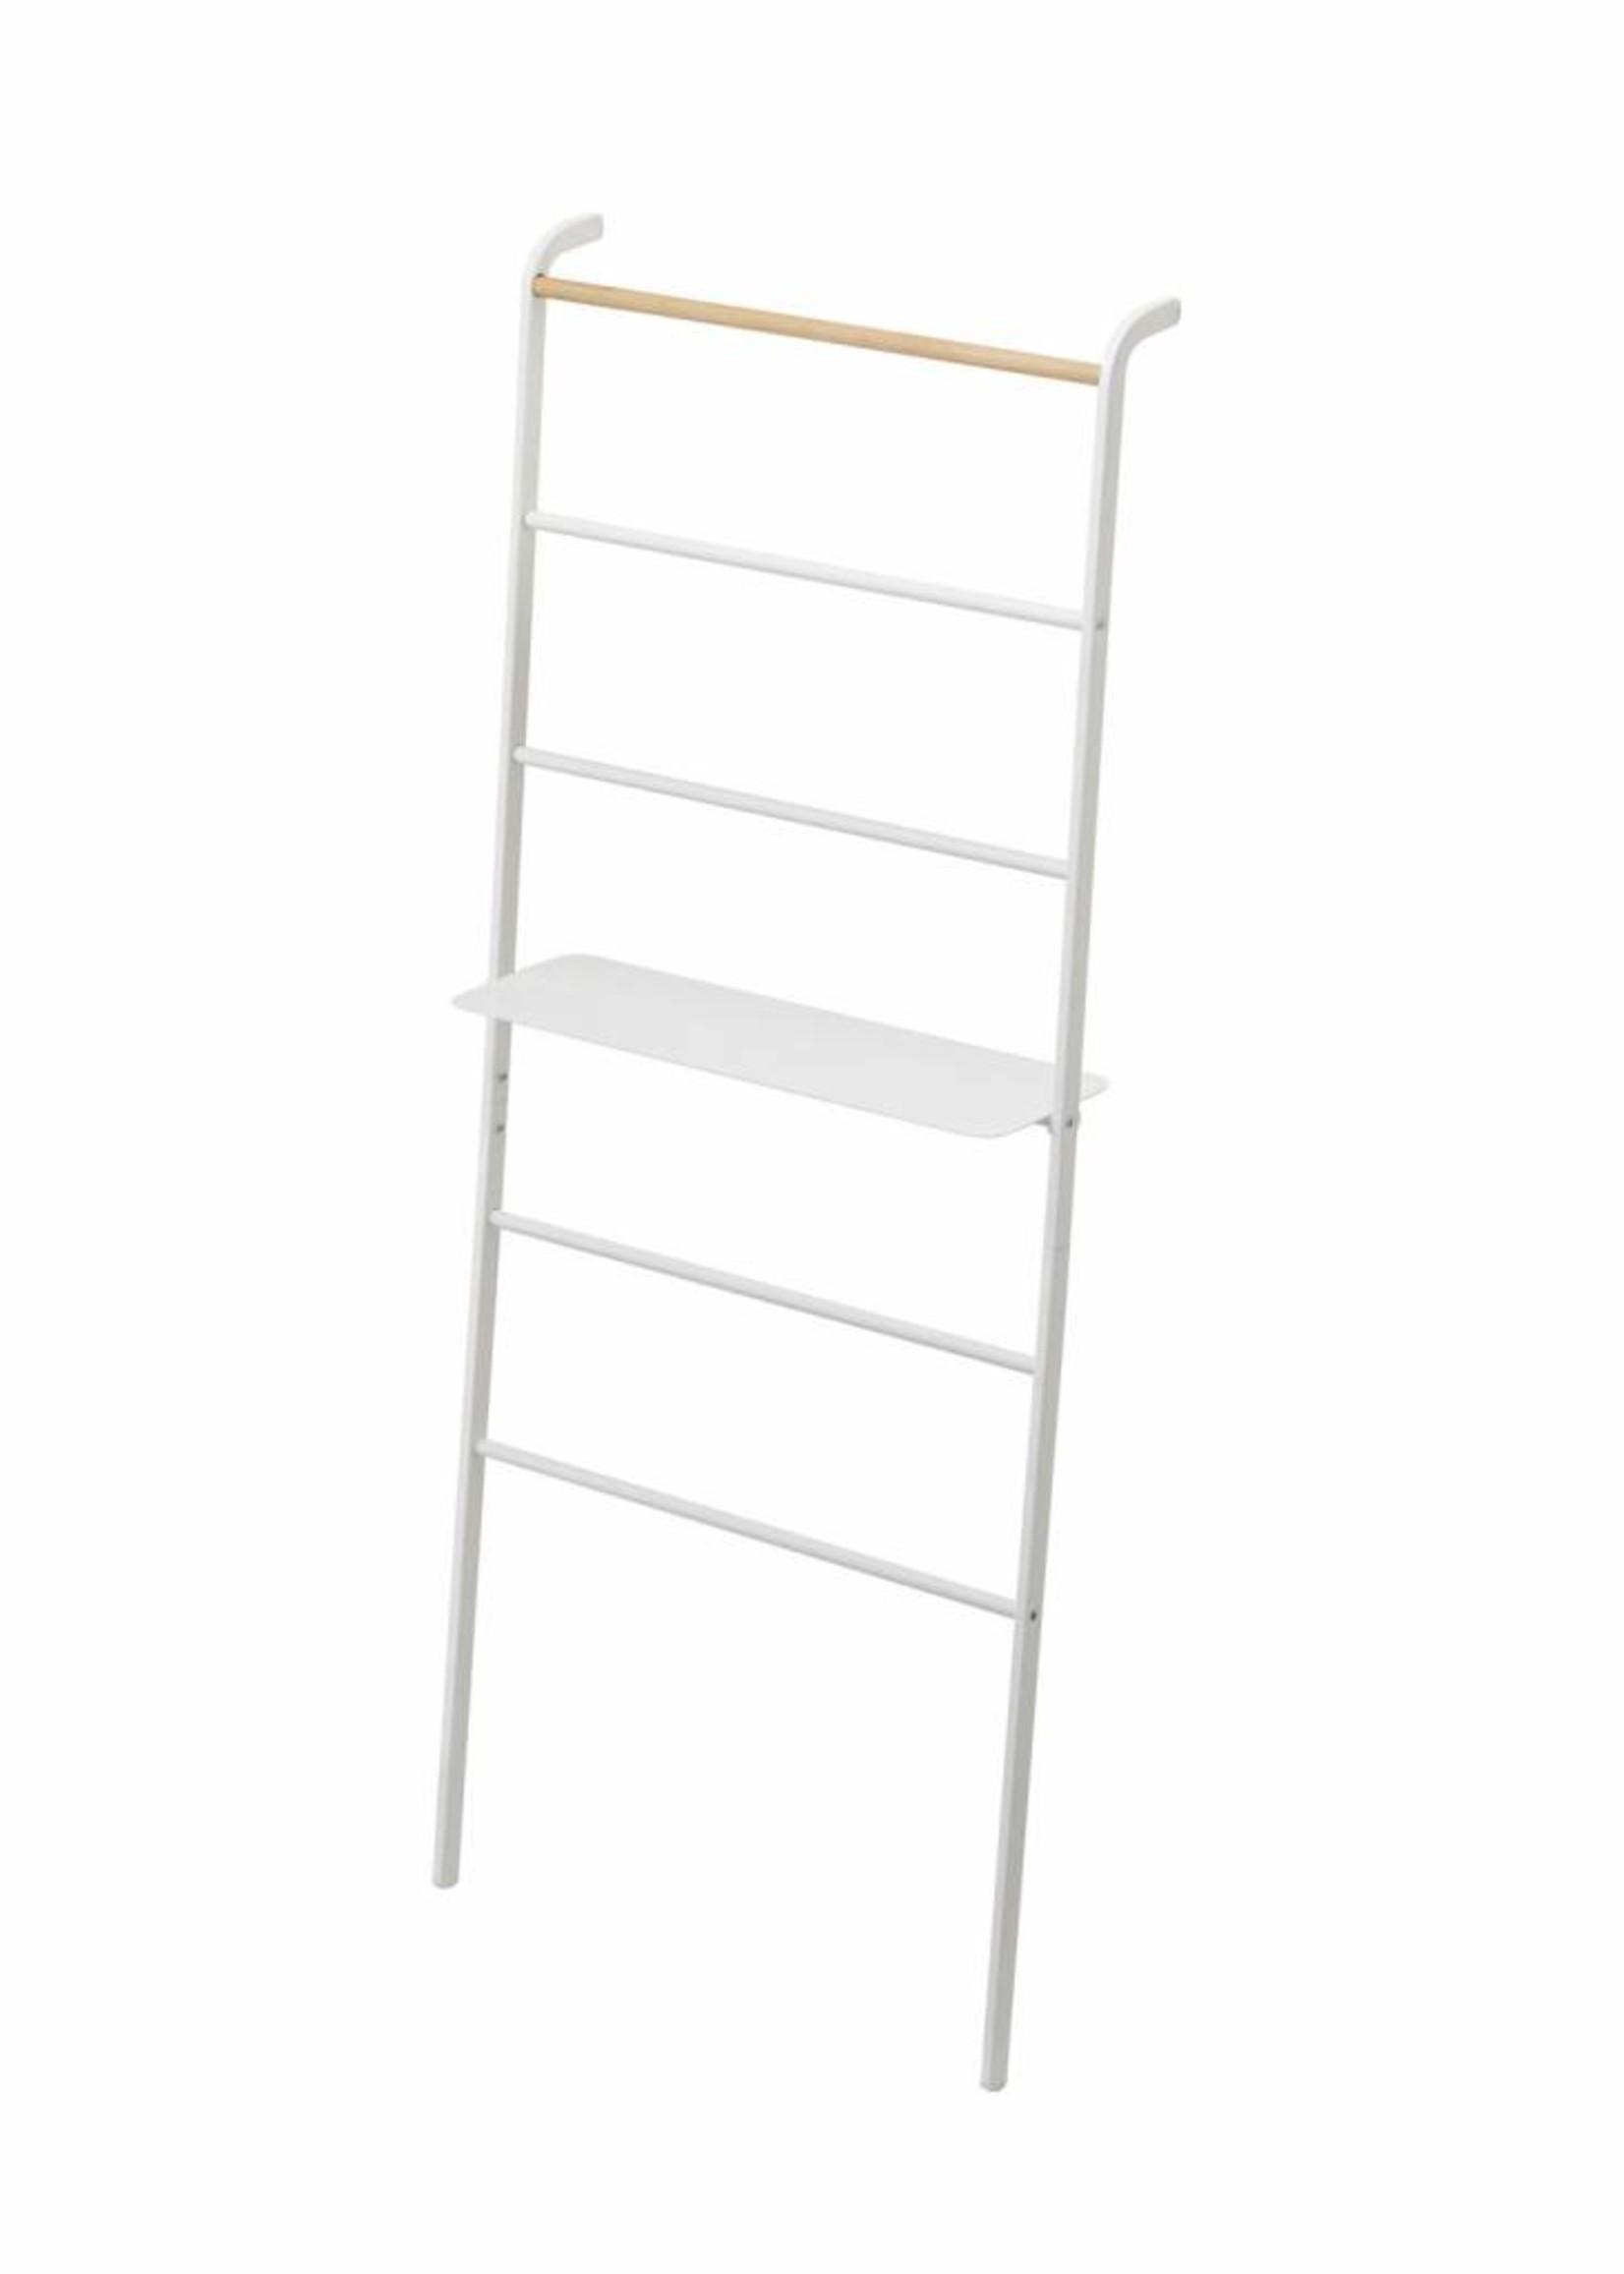 Yamazaki Ladder Hanger Wide with Rack - Tower